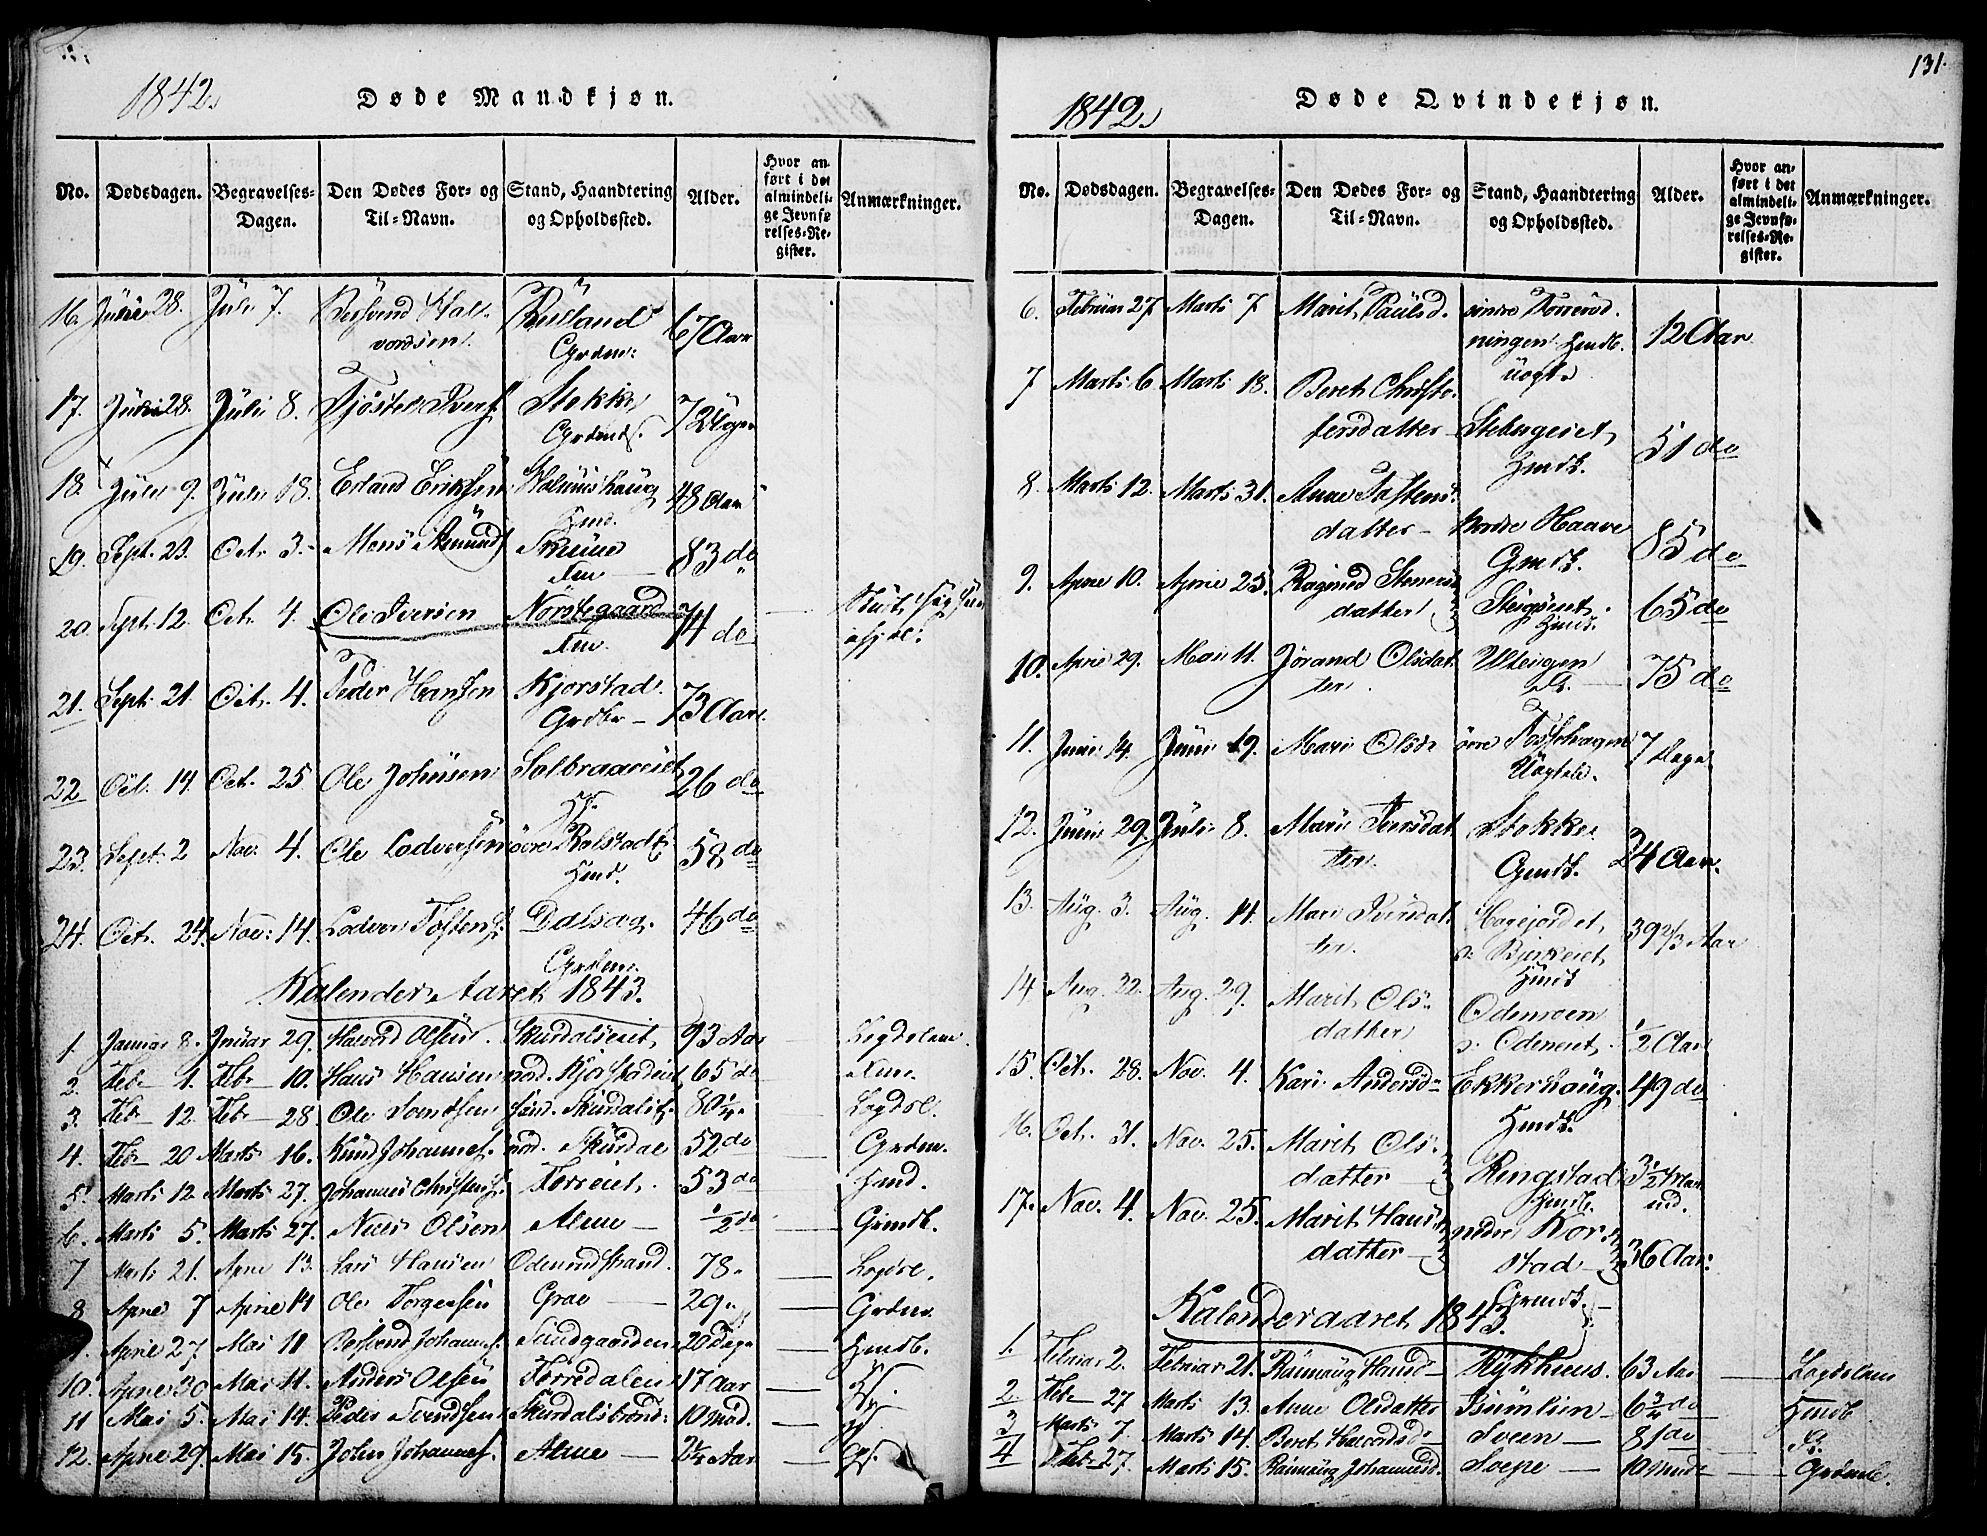 SAH, Fron prestekontor, H/Ha/Hab/L0001: Klokkerbok nr. 1, 1816-1843, s. 131